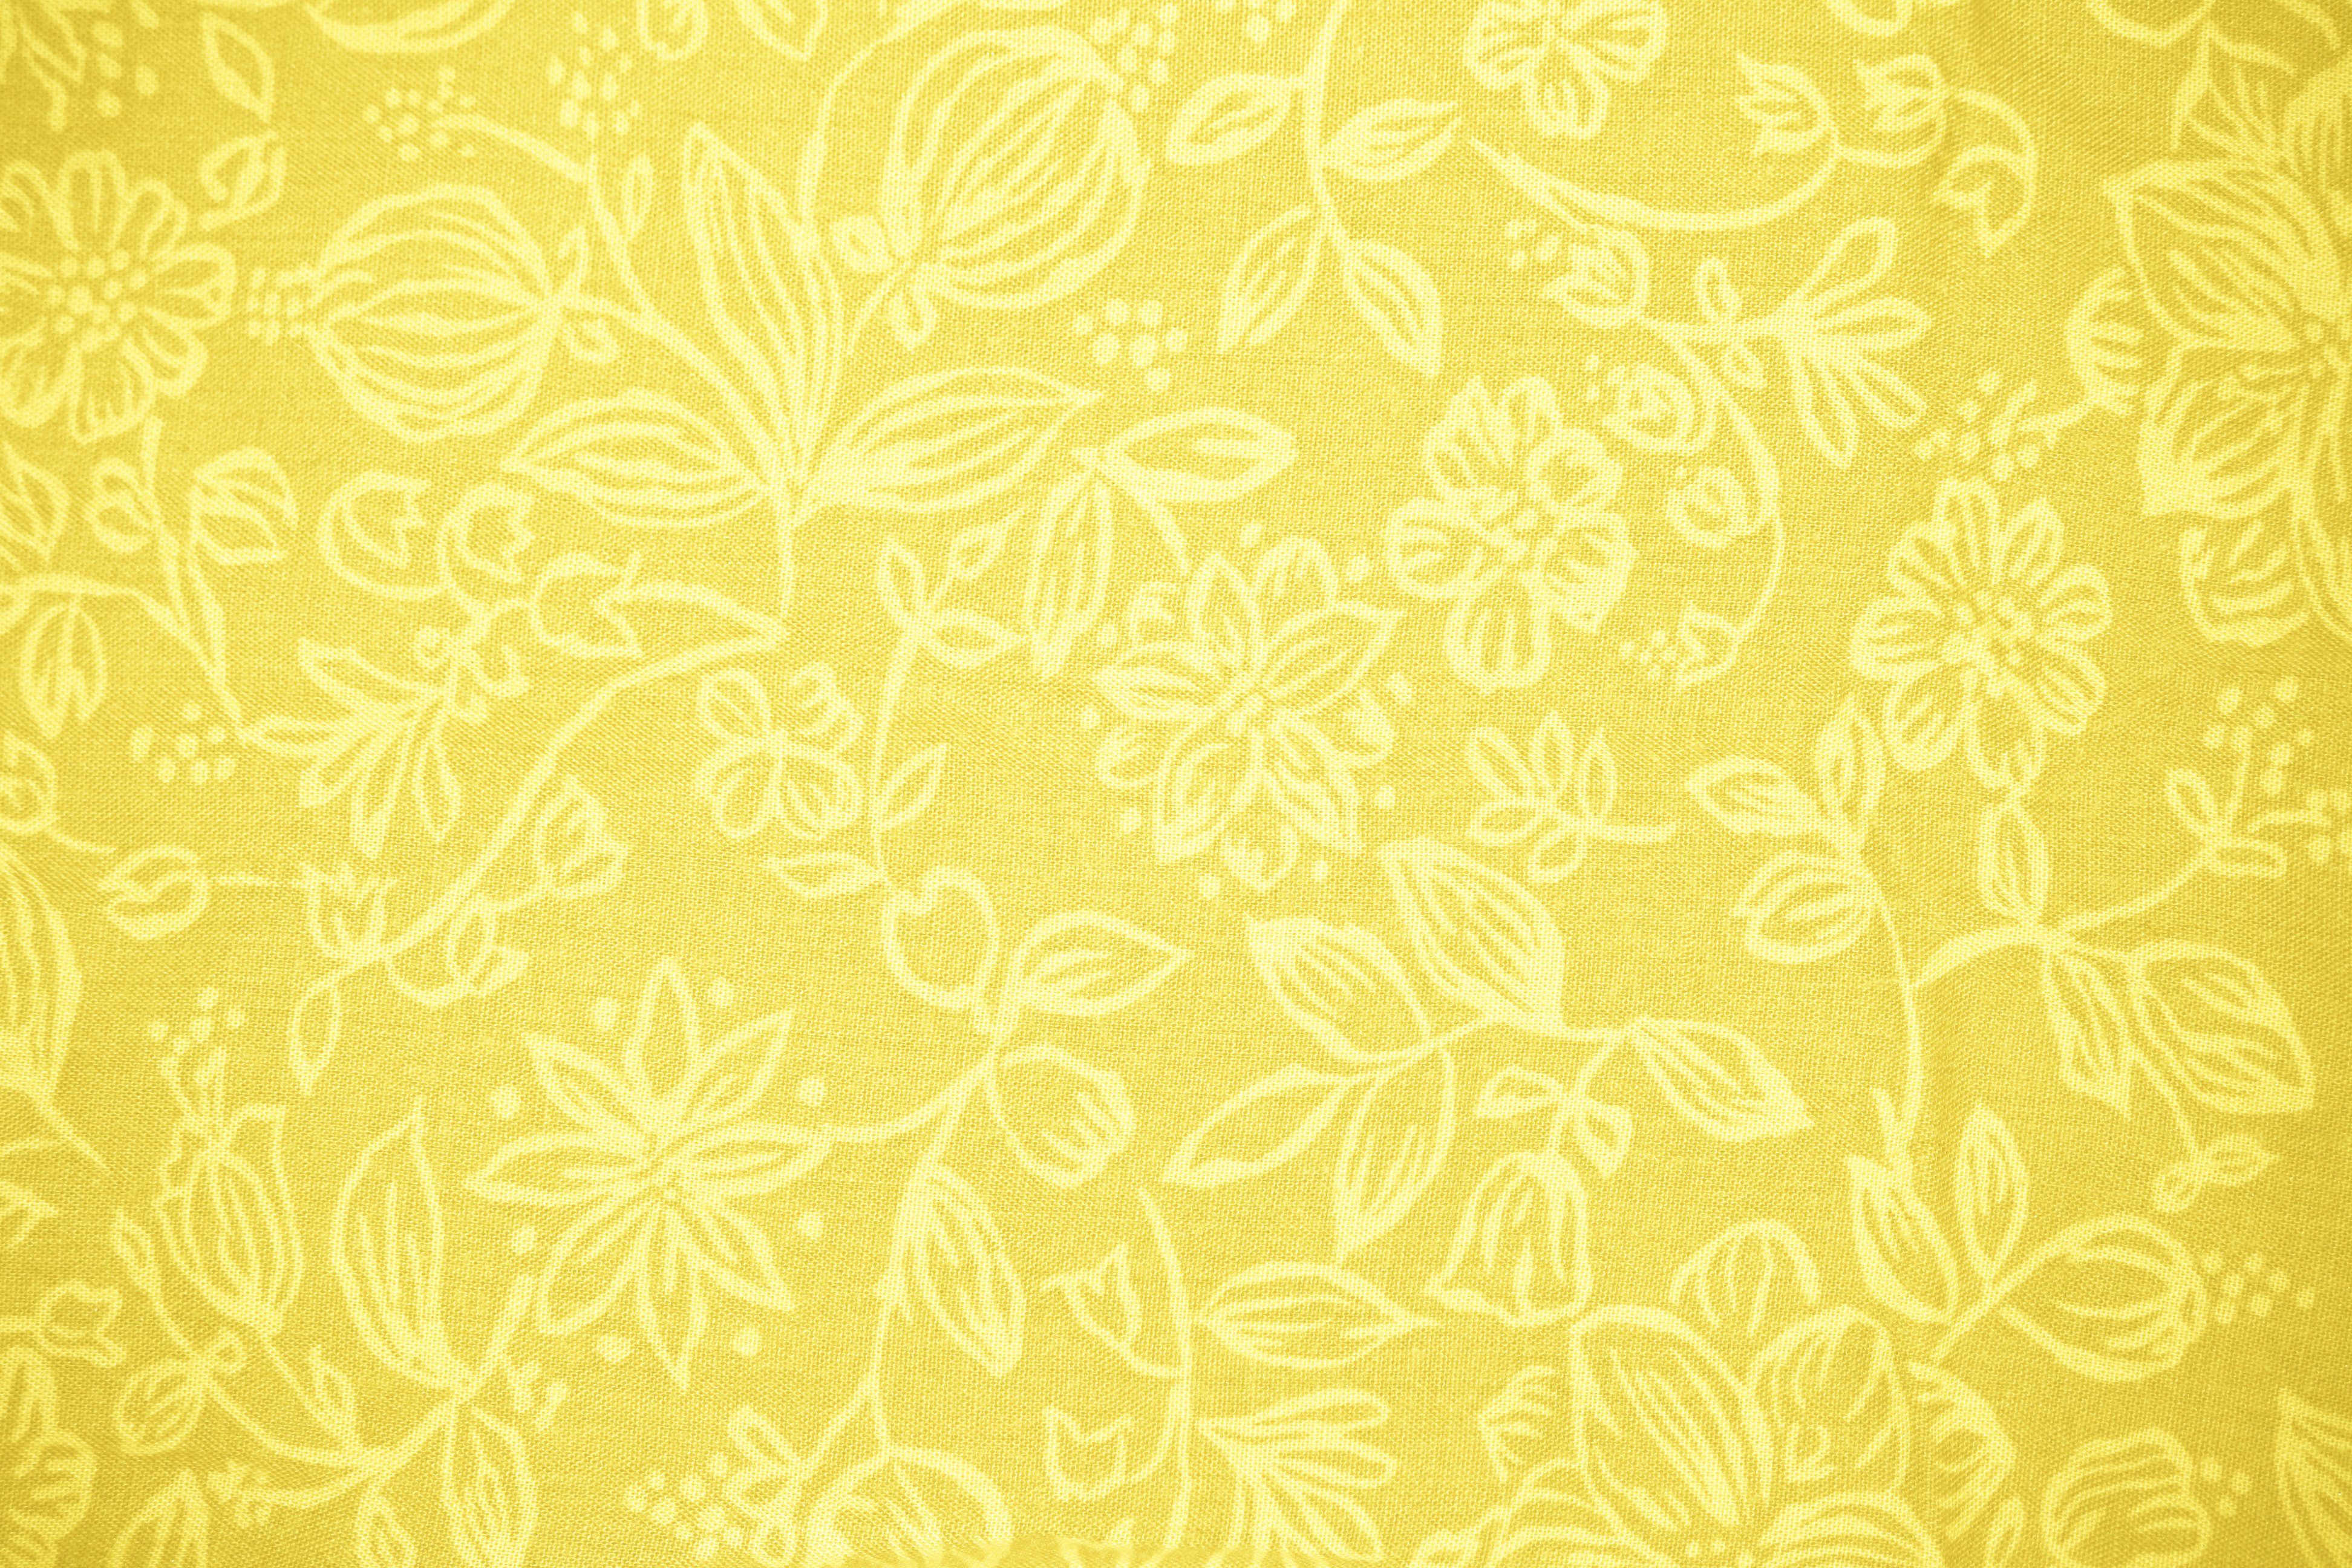 yellow floral wallpaper 2015   Grasscloth Wallpaper 3888x2592